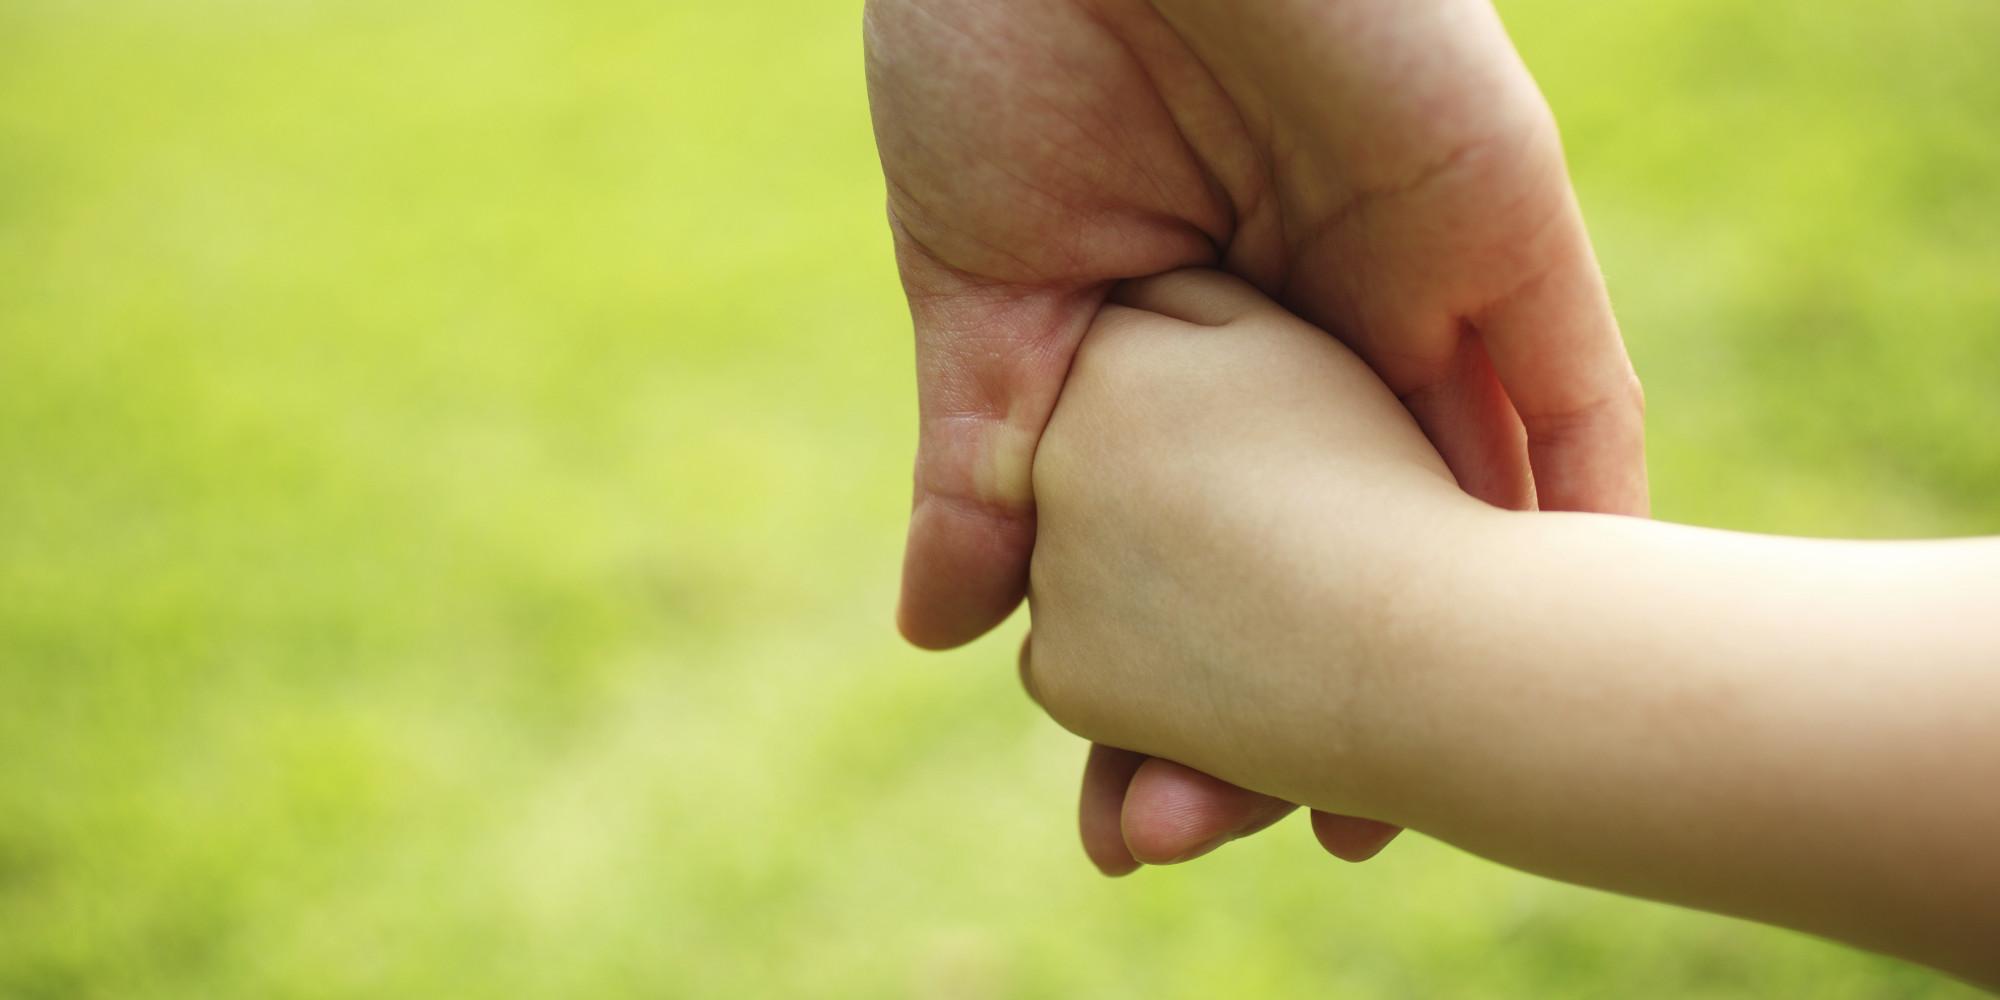 Adoption & Pre-Adoption Genetic Testing - About Islam